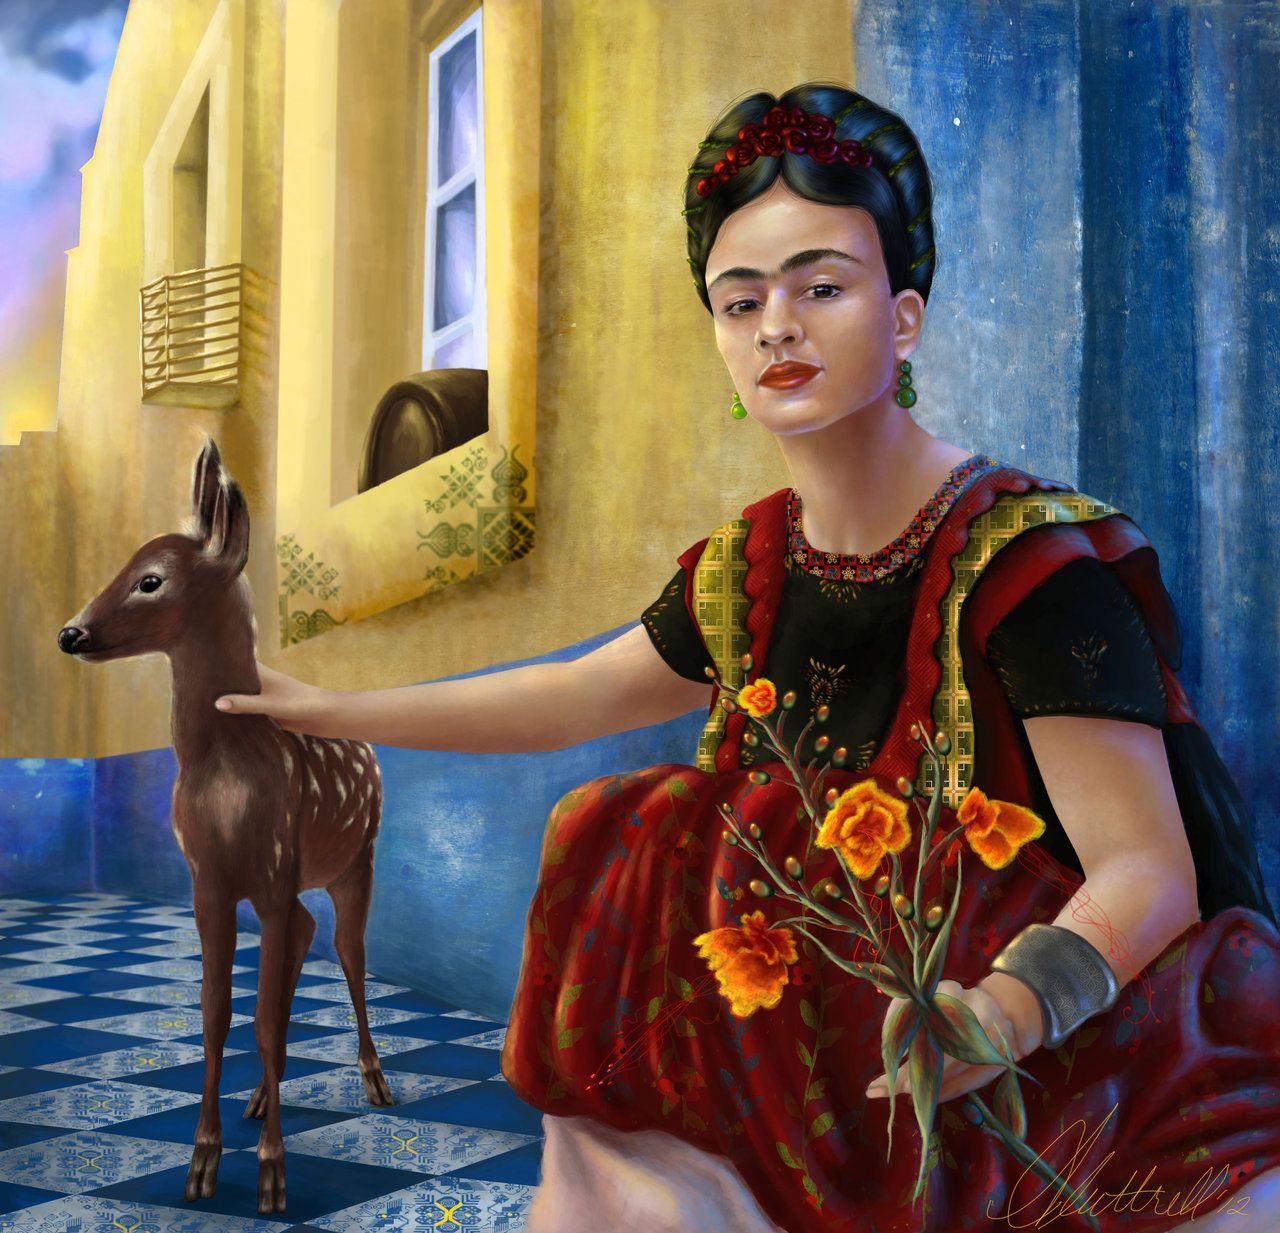 frida kahlo artwork and meaning | Frida Kahlo Paintings ...